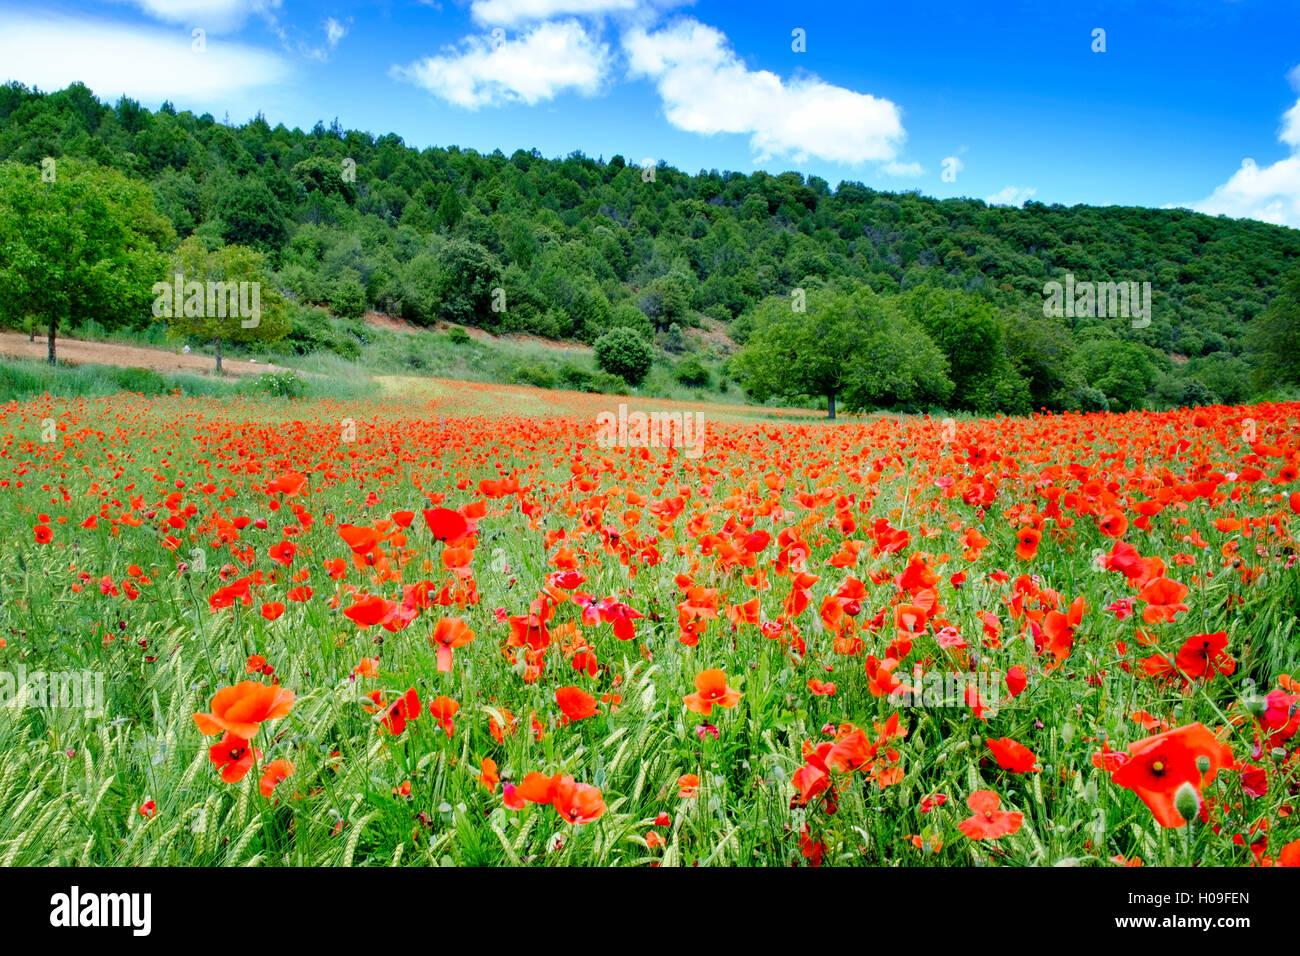 Poppy fields near Covarrubias, Castile and Leon, Spain Europe - Stock Image